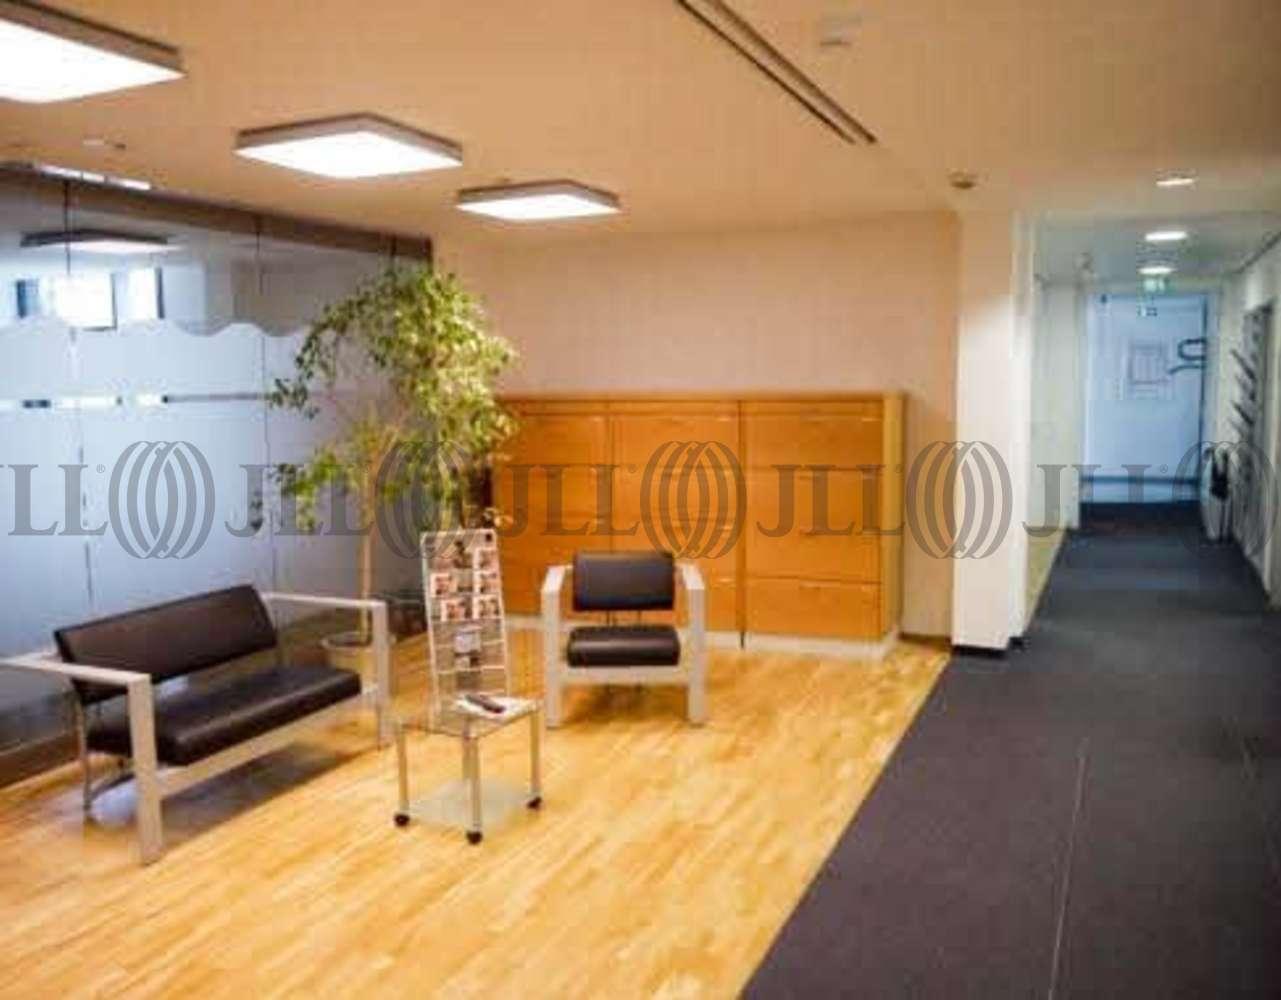 Büros Frankfurt am main, 60326 - Büro - Frankfurt am Main - F0643 - 10581730